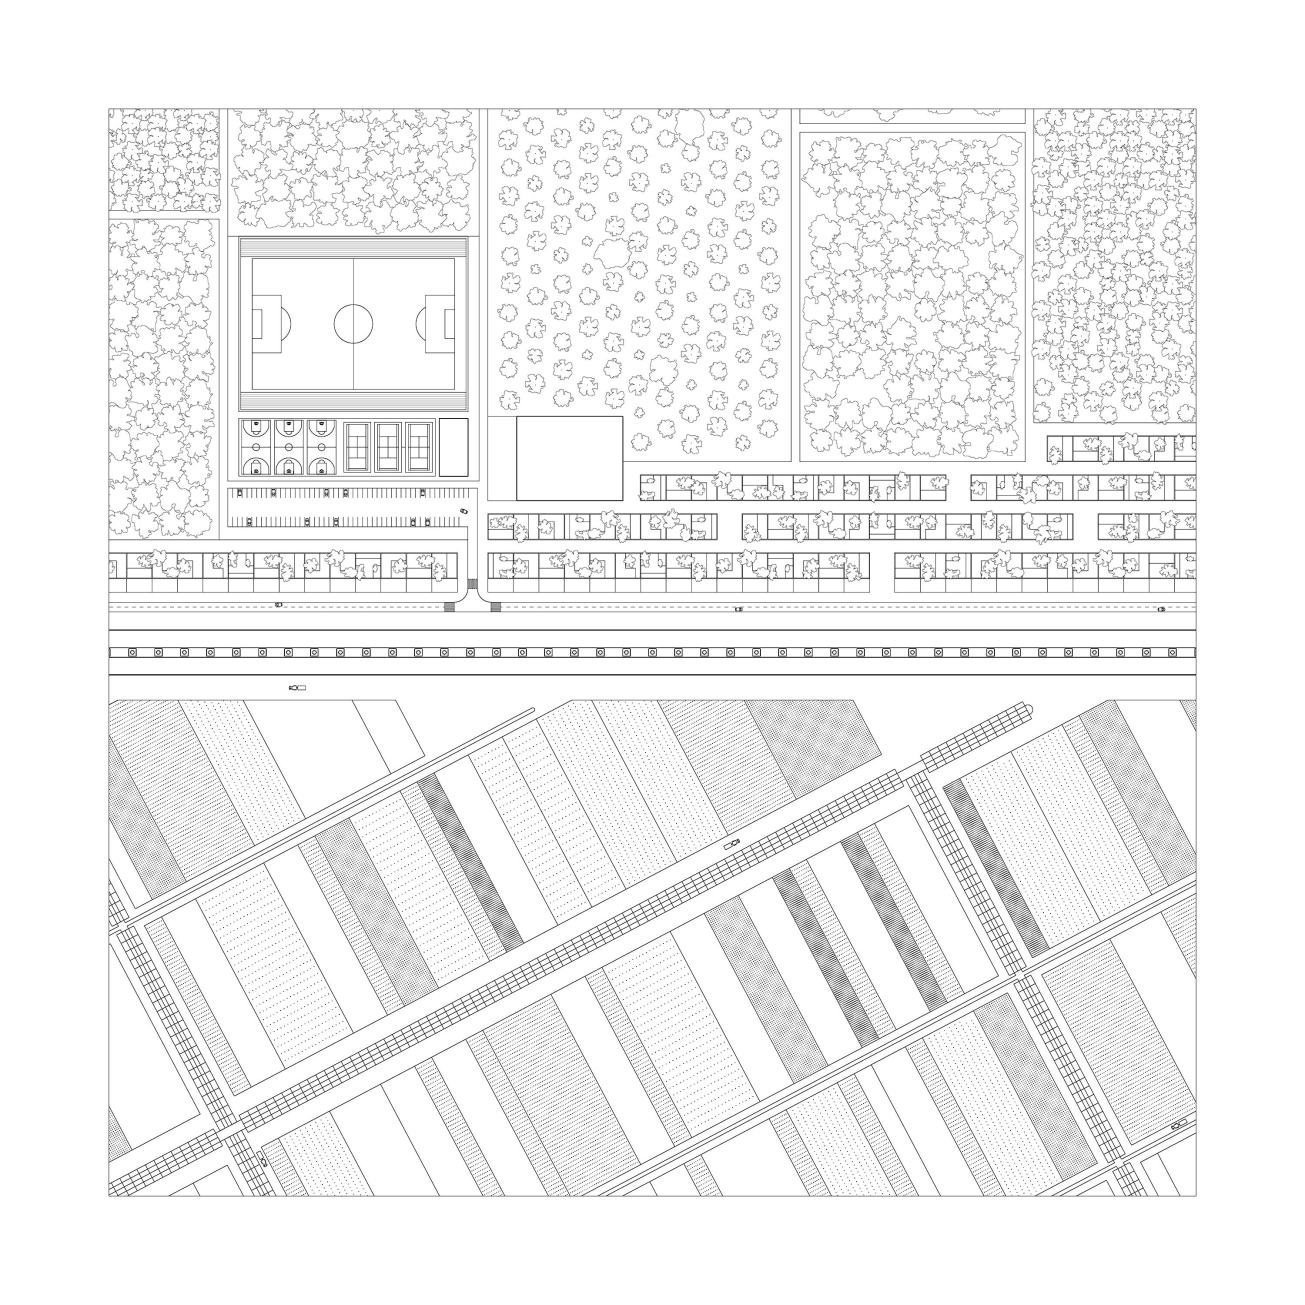 Villages 04 Roof Plan - Cebolla, Toledo